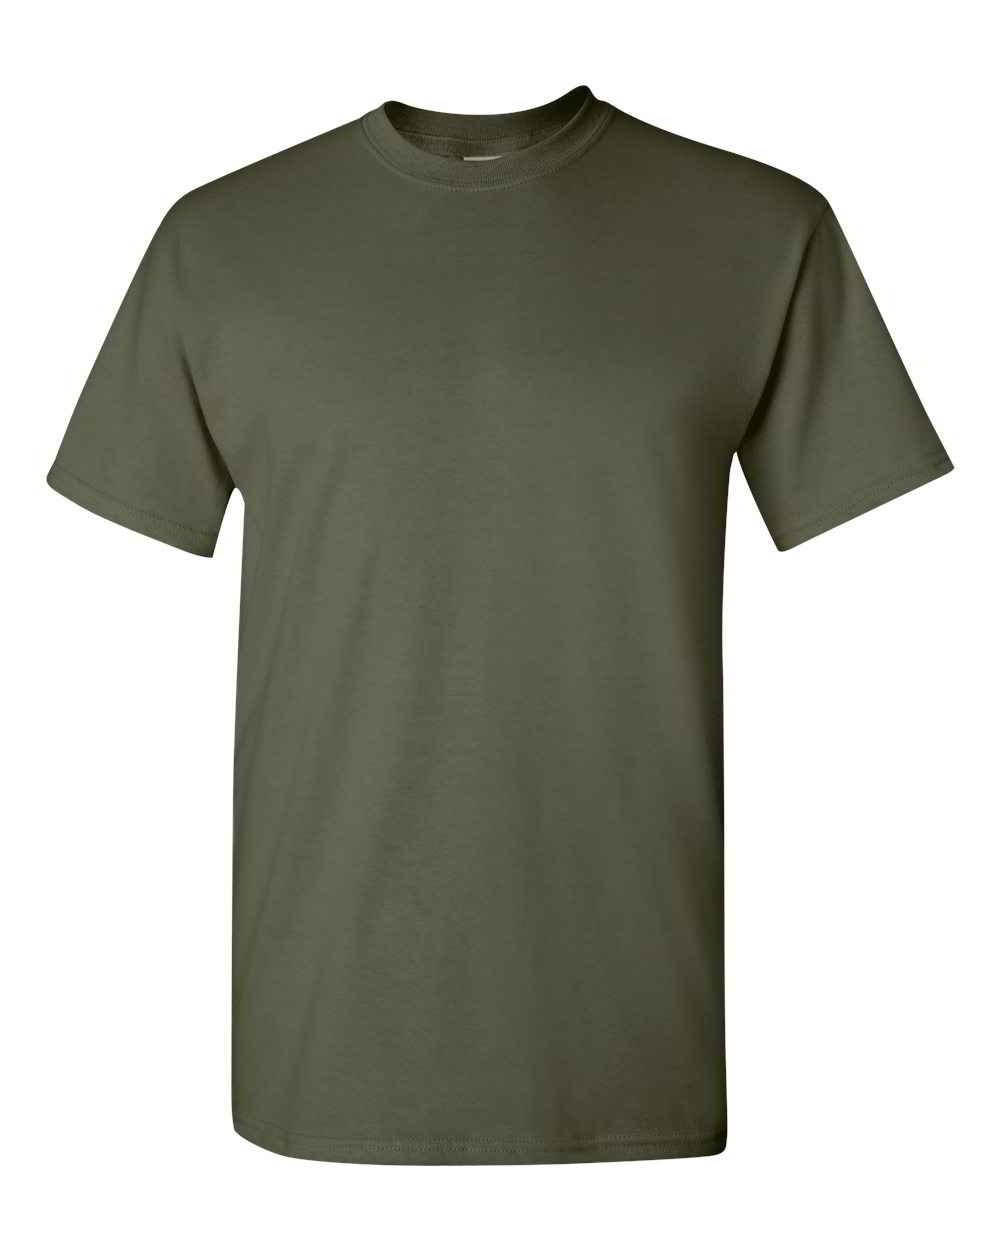 Gildan-Heavy-Cotton-Short-Sleeve-Mens-Green-T-Shirts-5000 thumbnail 22